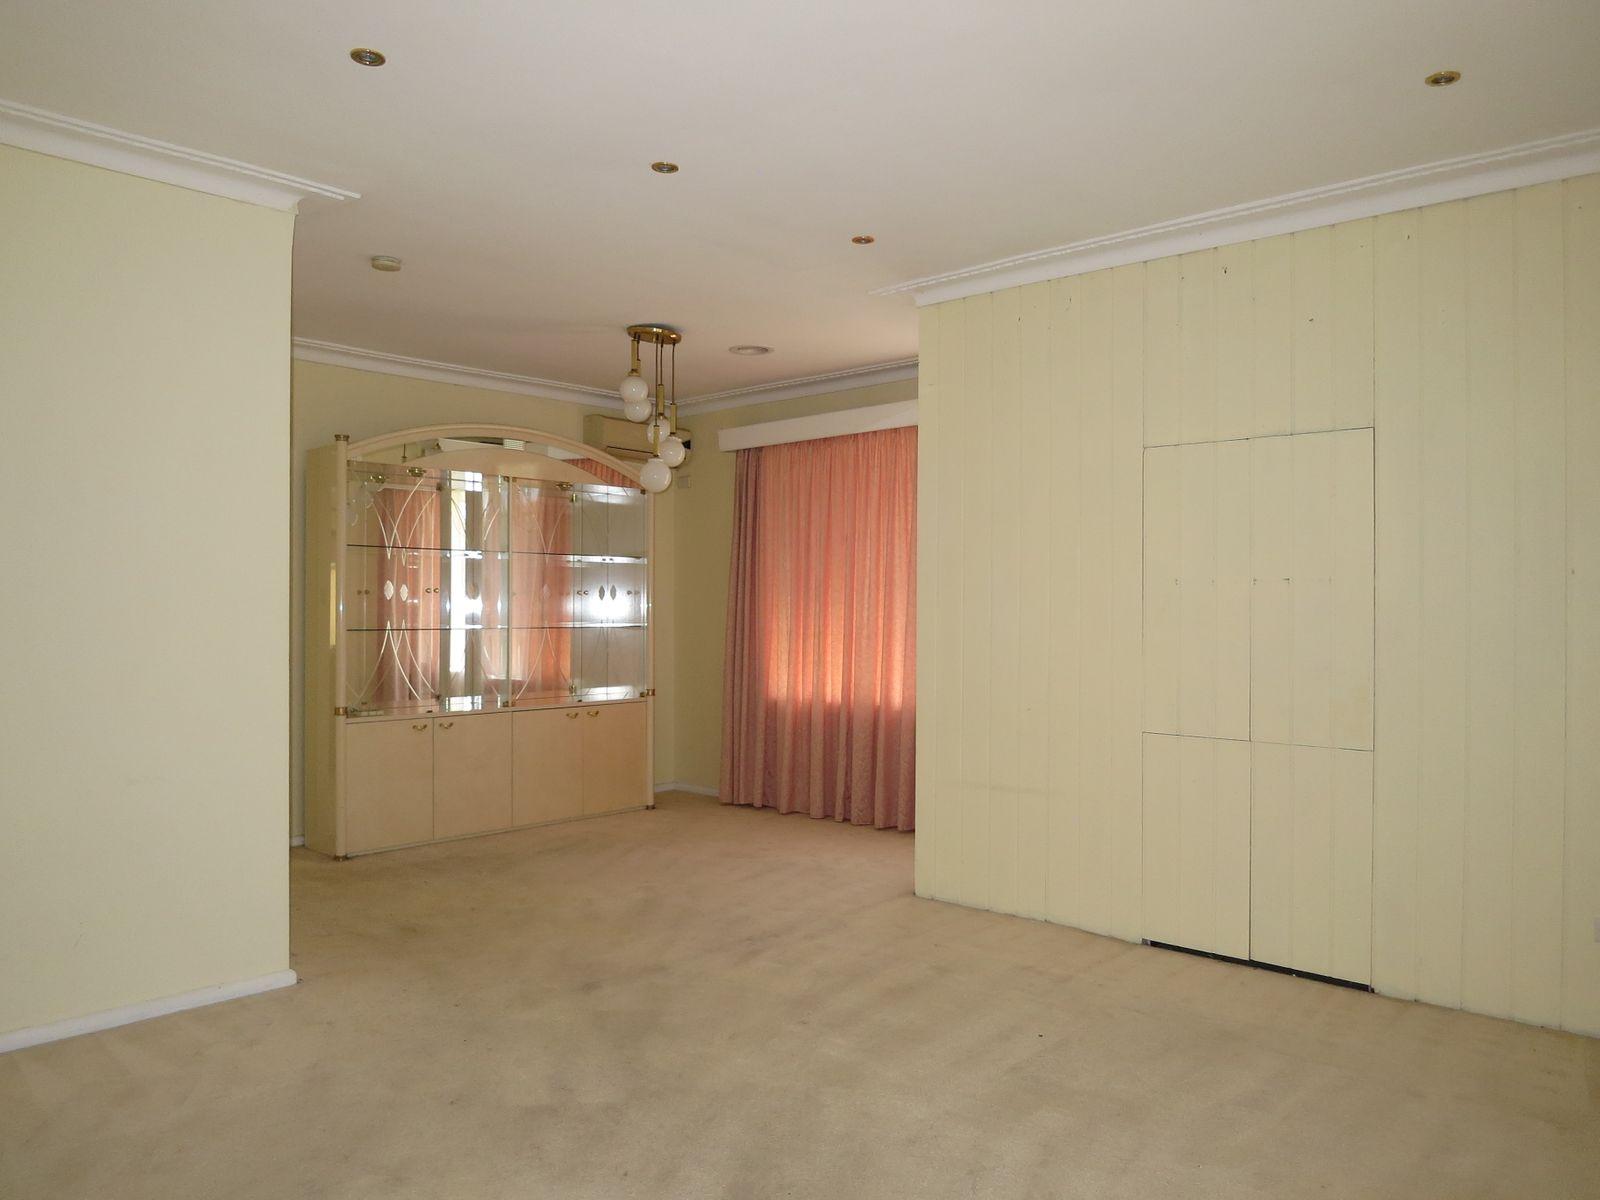 11 Joan Crescent, Burwood East, VIC 3151